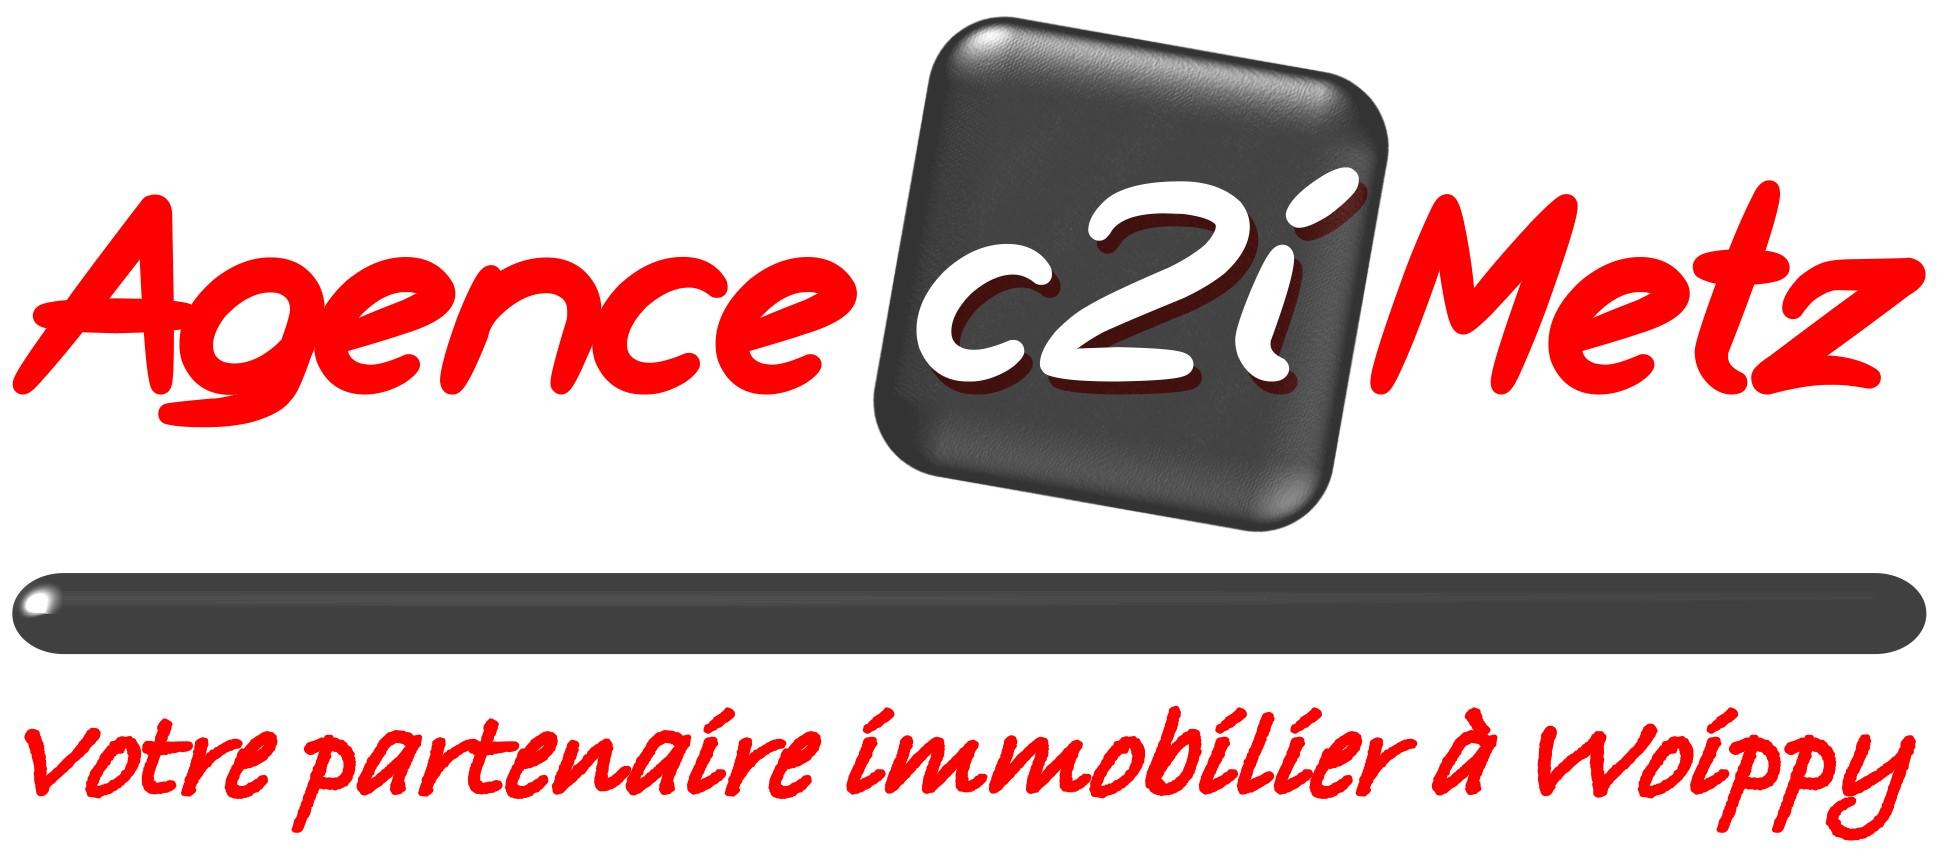 agence_c2i